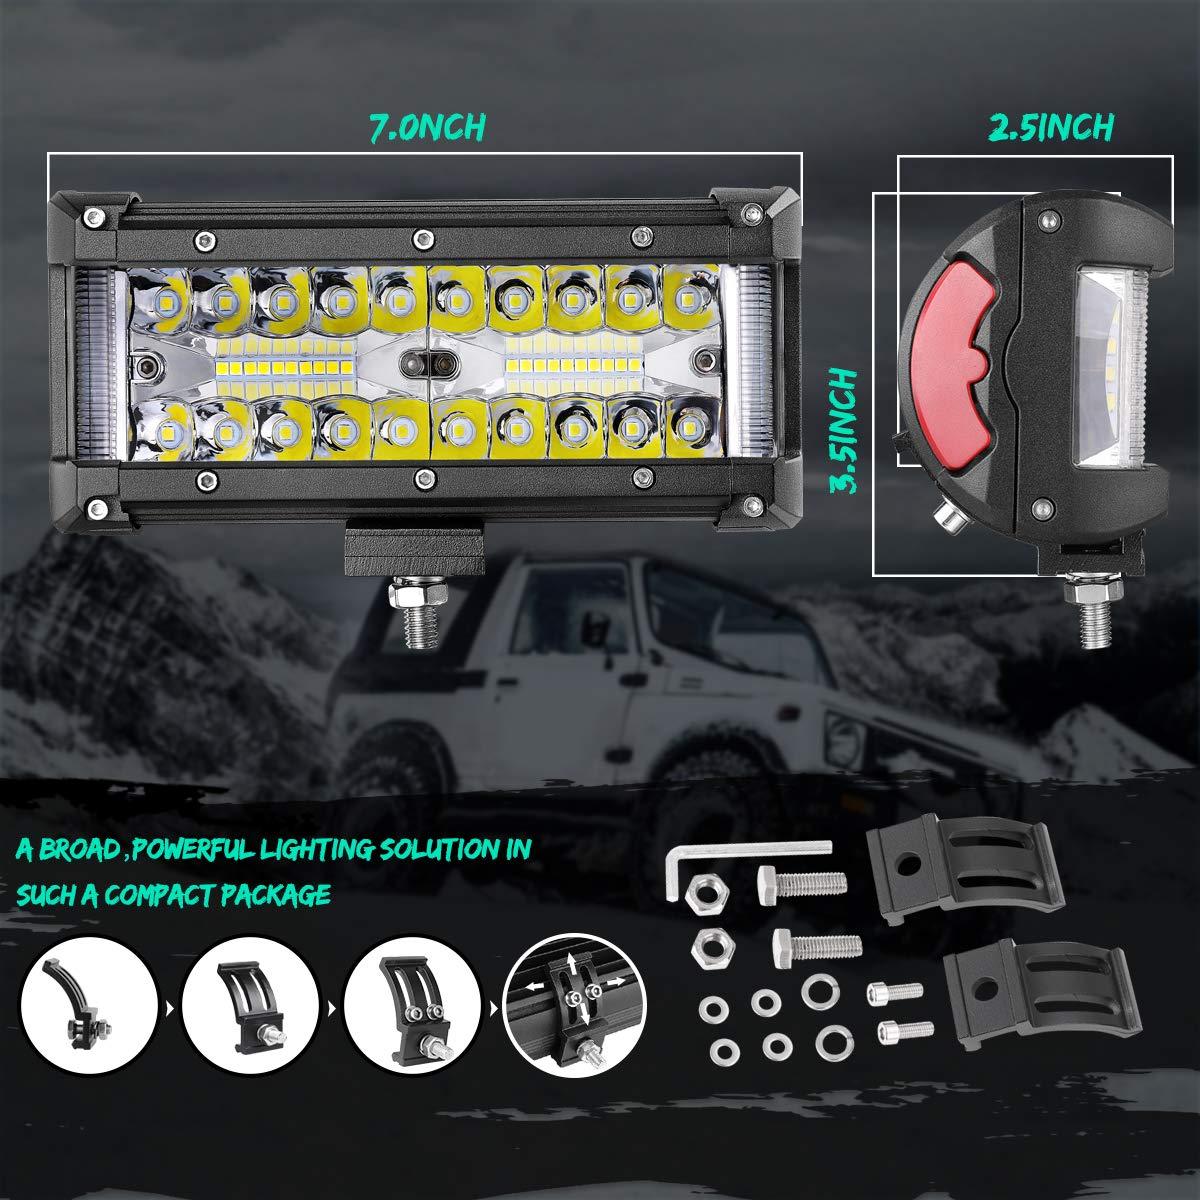 2 Yr Warranty LED Light Bar 30 Swatow Industries 230W OSRAM Spot Flood Combo Slim Off Road Light Bar Dual Row Fog lights Work Lights LED Bumper Lights LED Driving Lights for Truck SUV UTV ATV Boat